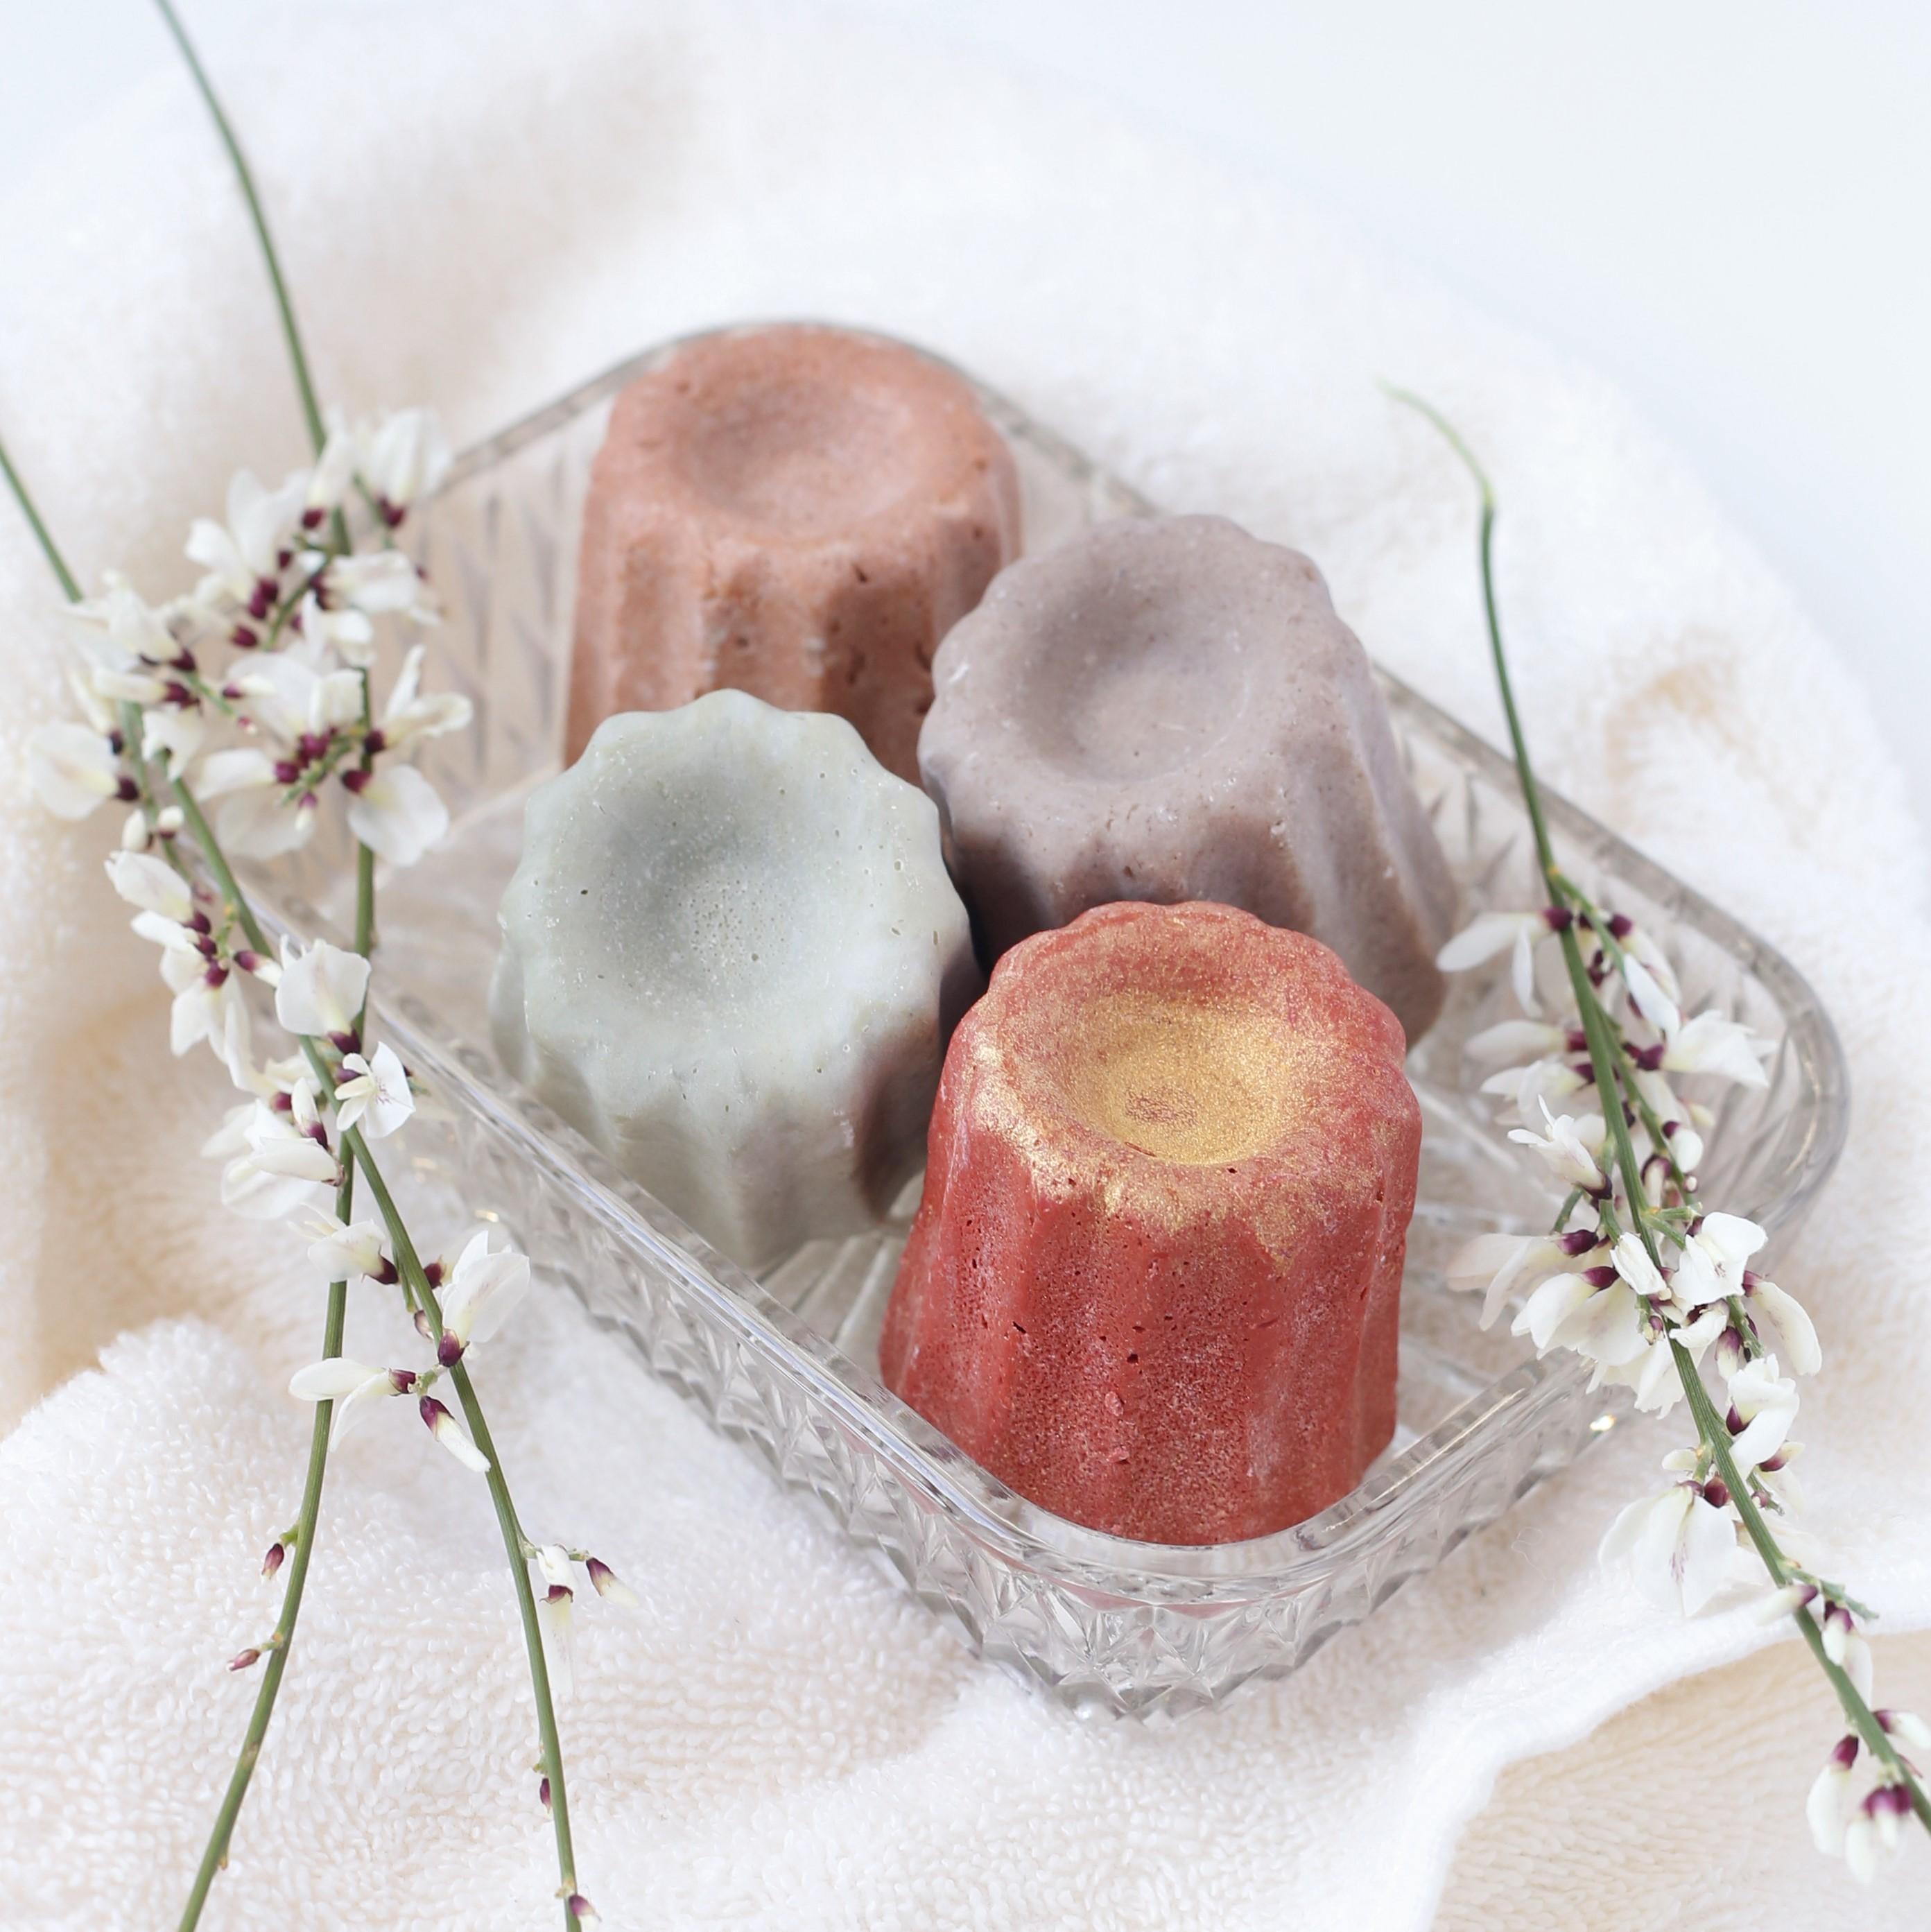 troc de troc epuise shampoing solide vanille coco lamazuna image 1